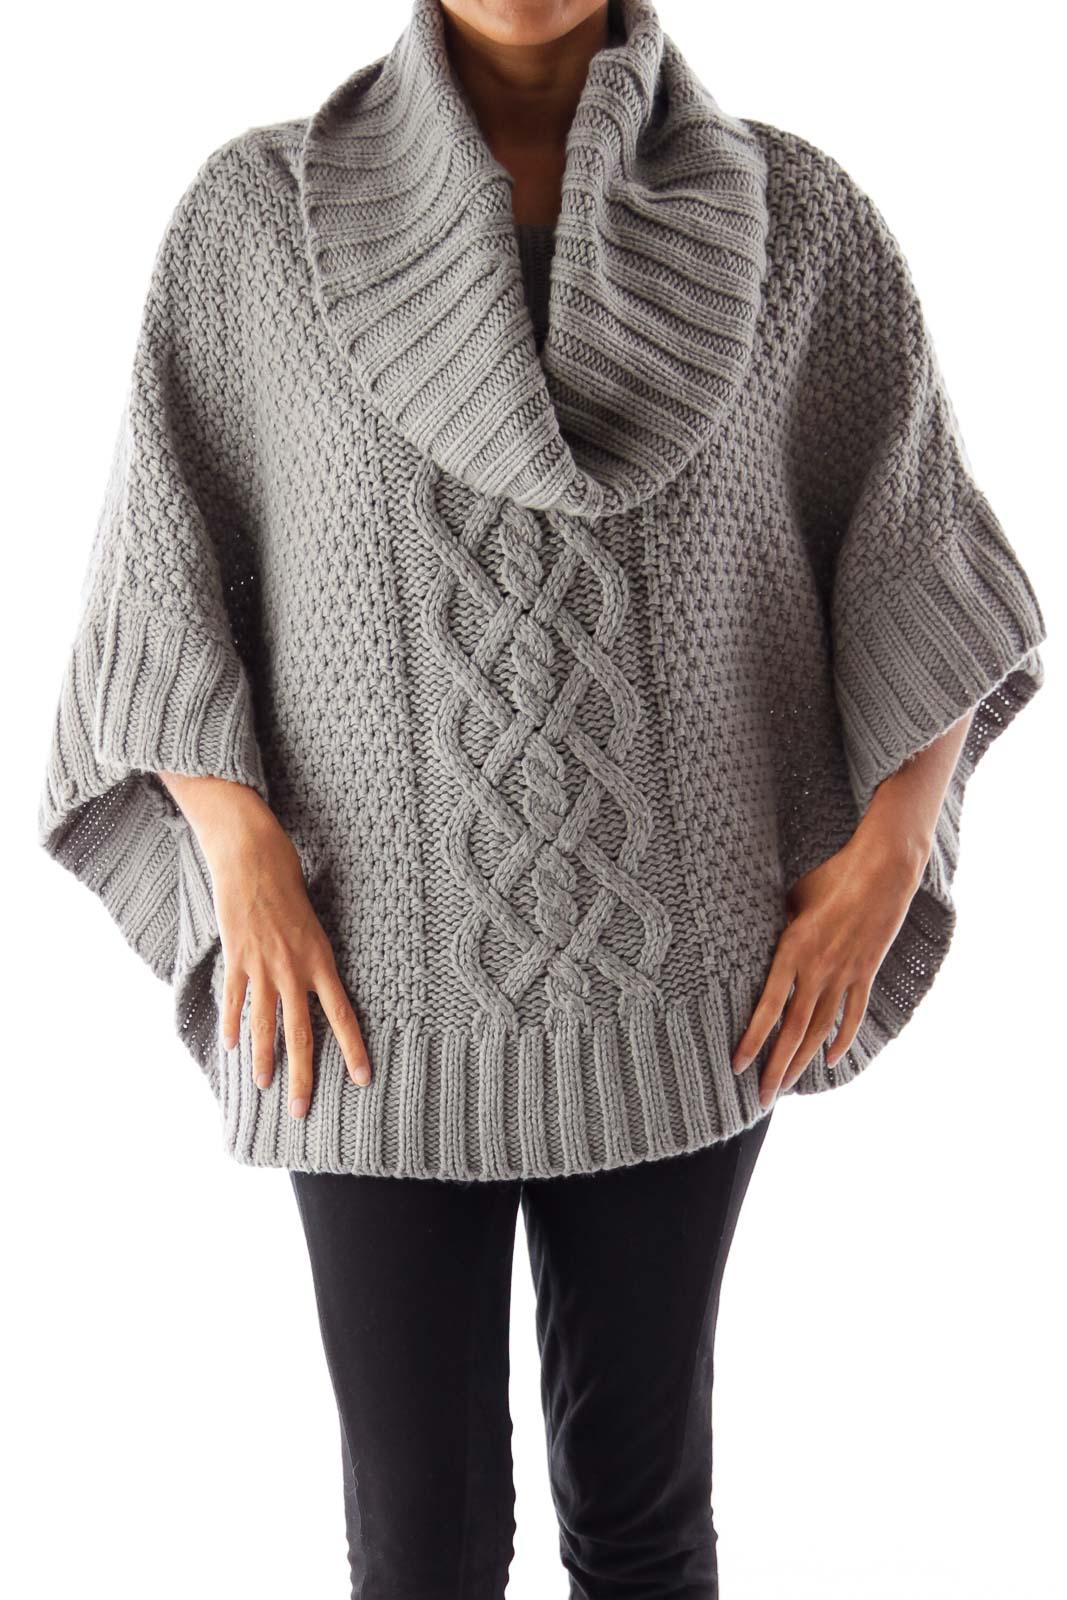 Gray Turtleneck Knit Cape Front